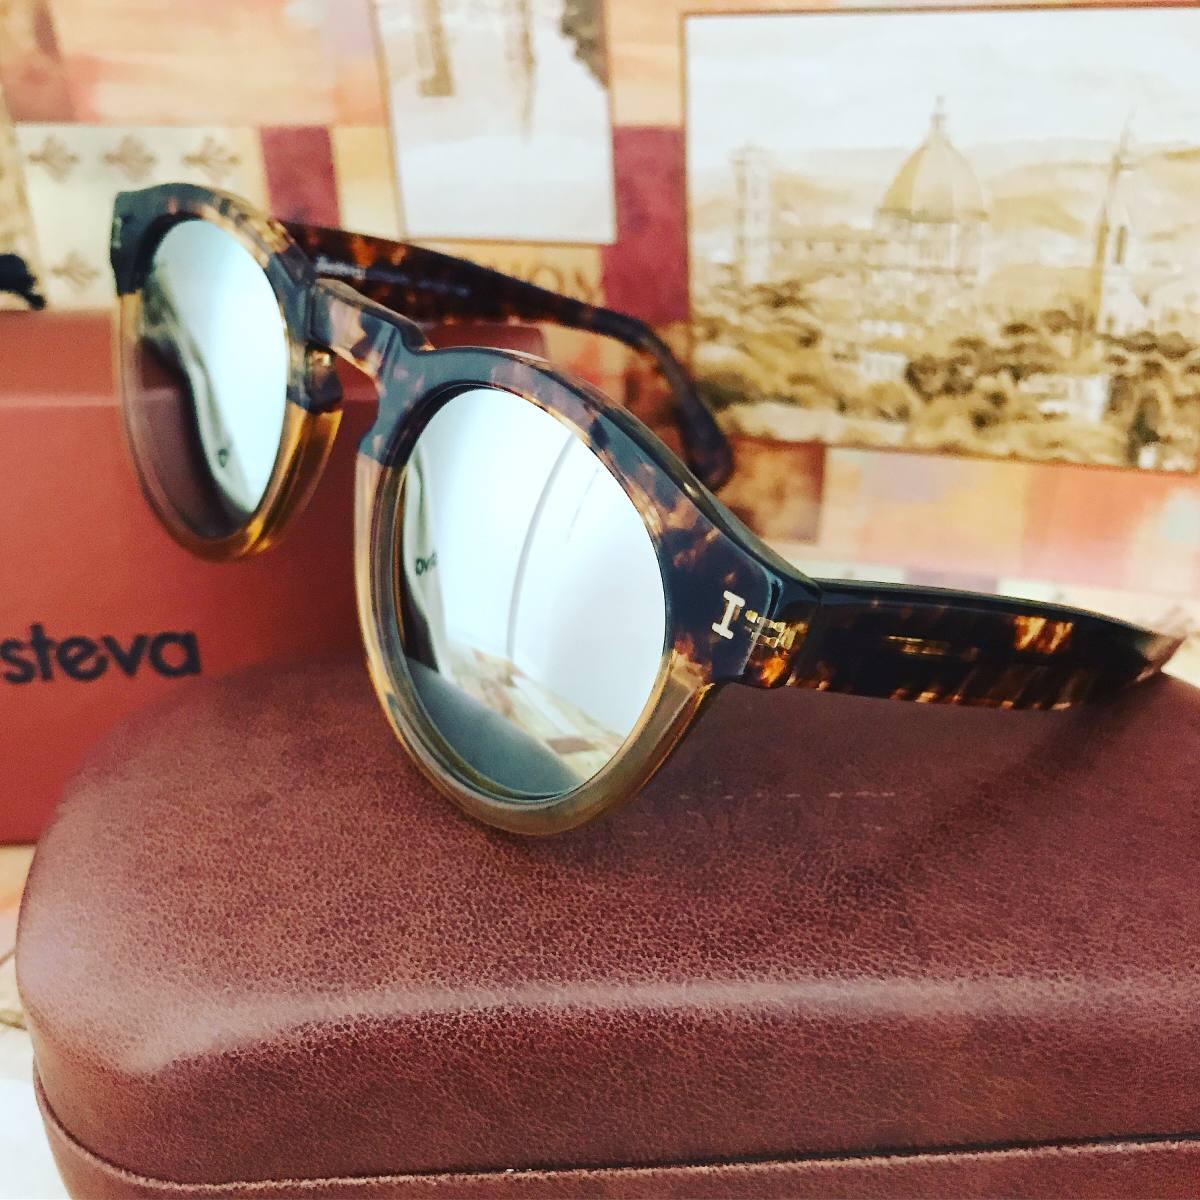 eff585c14 Óculos Illesteva Made In Italy ¿¿ - R$ 899,00 em Mercado Livre